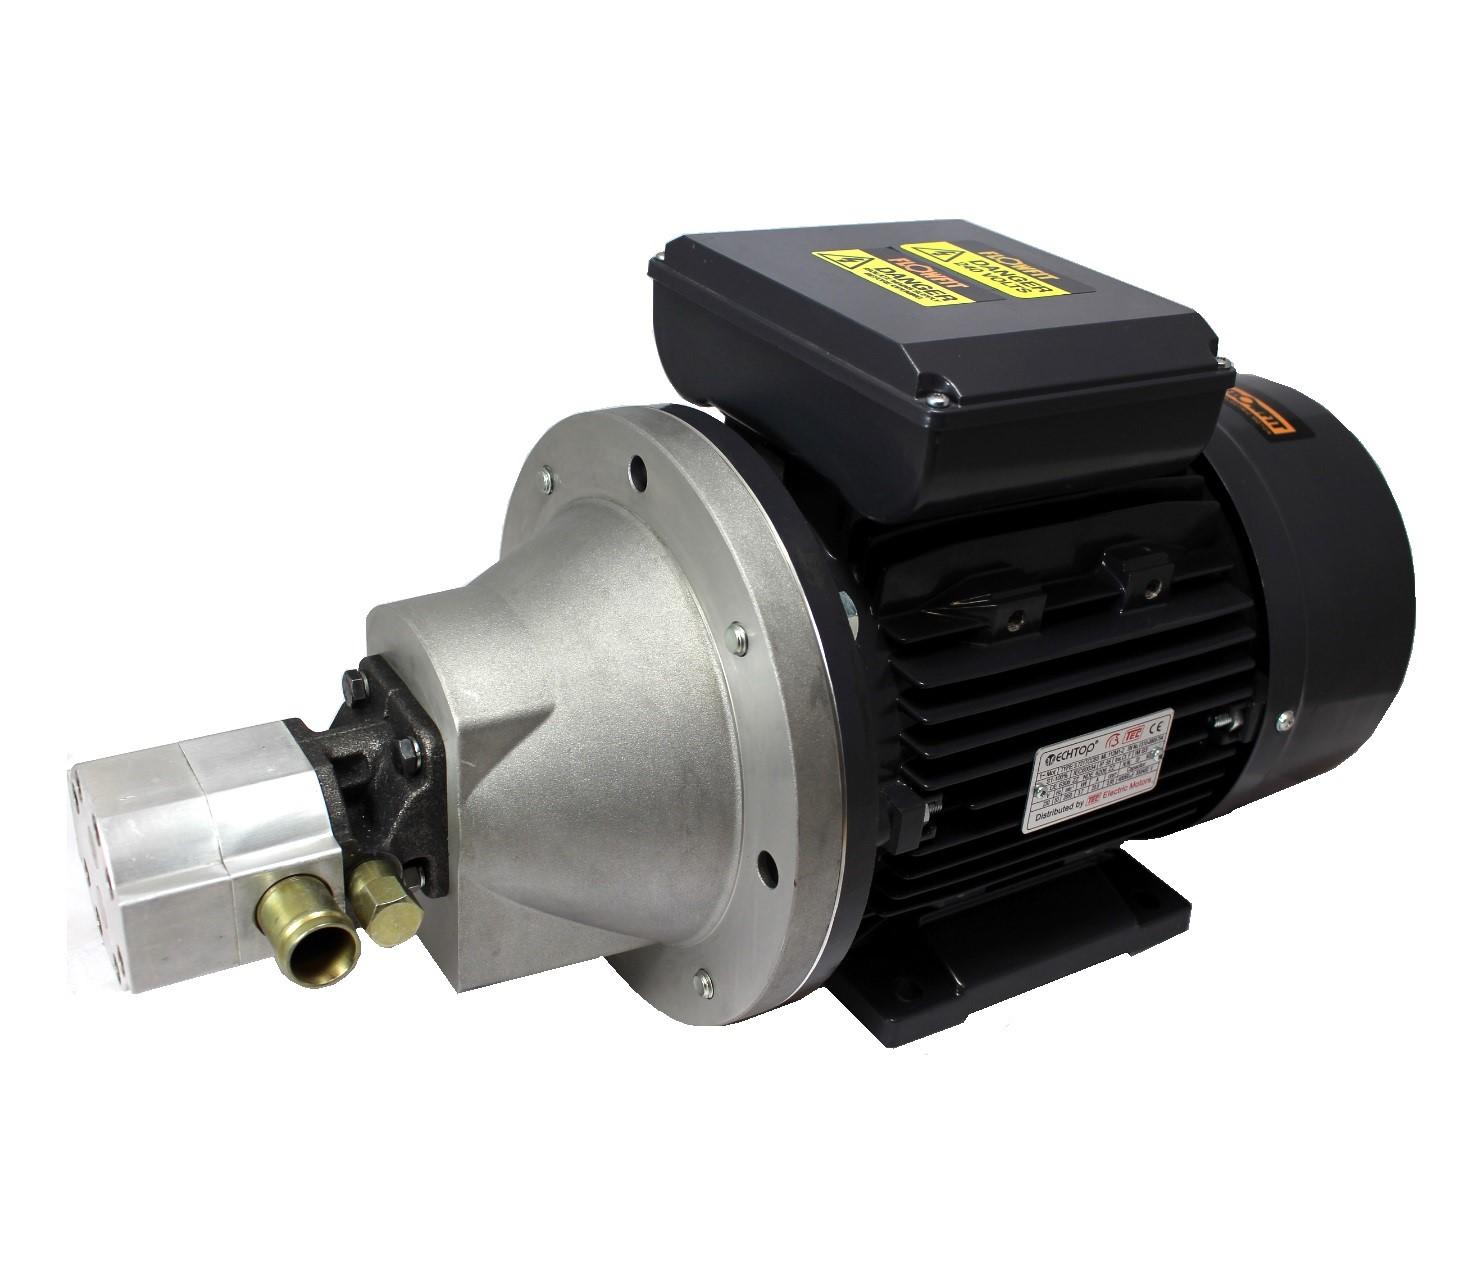 Hydraulic electric motor pump set 3 7kw 240v single phase for Hydraulic pump with motor